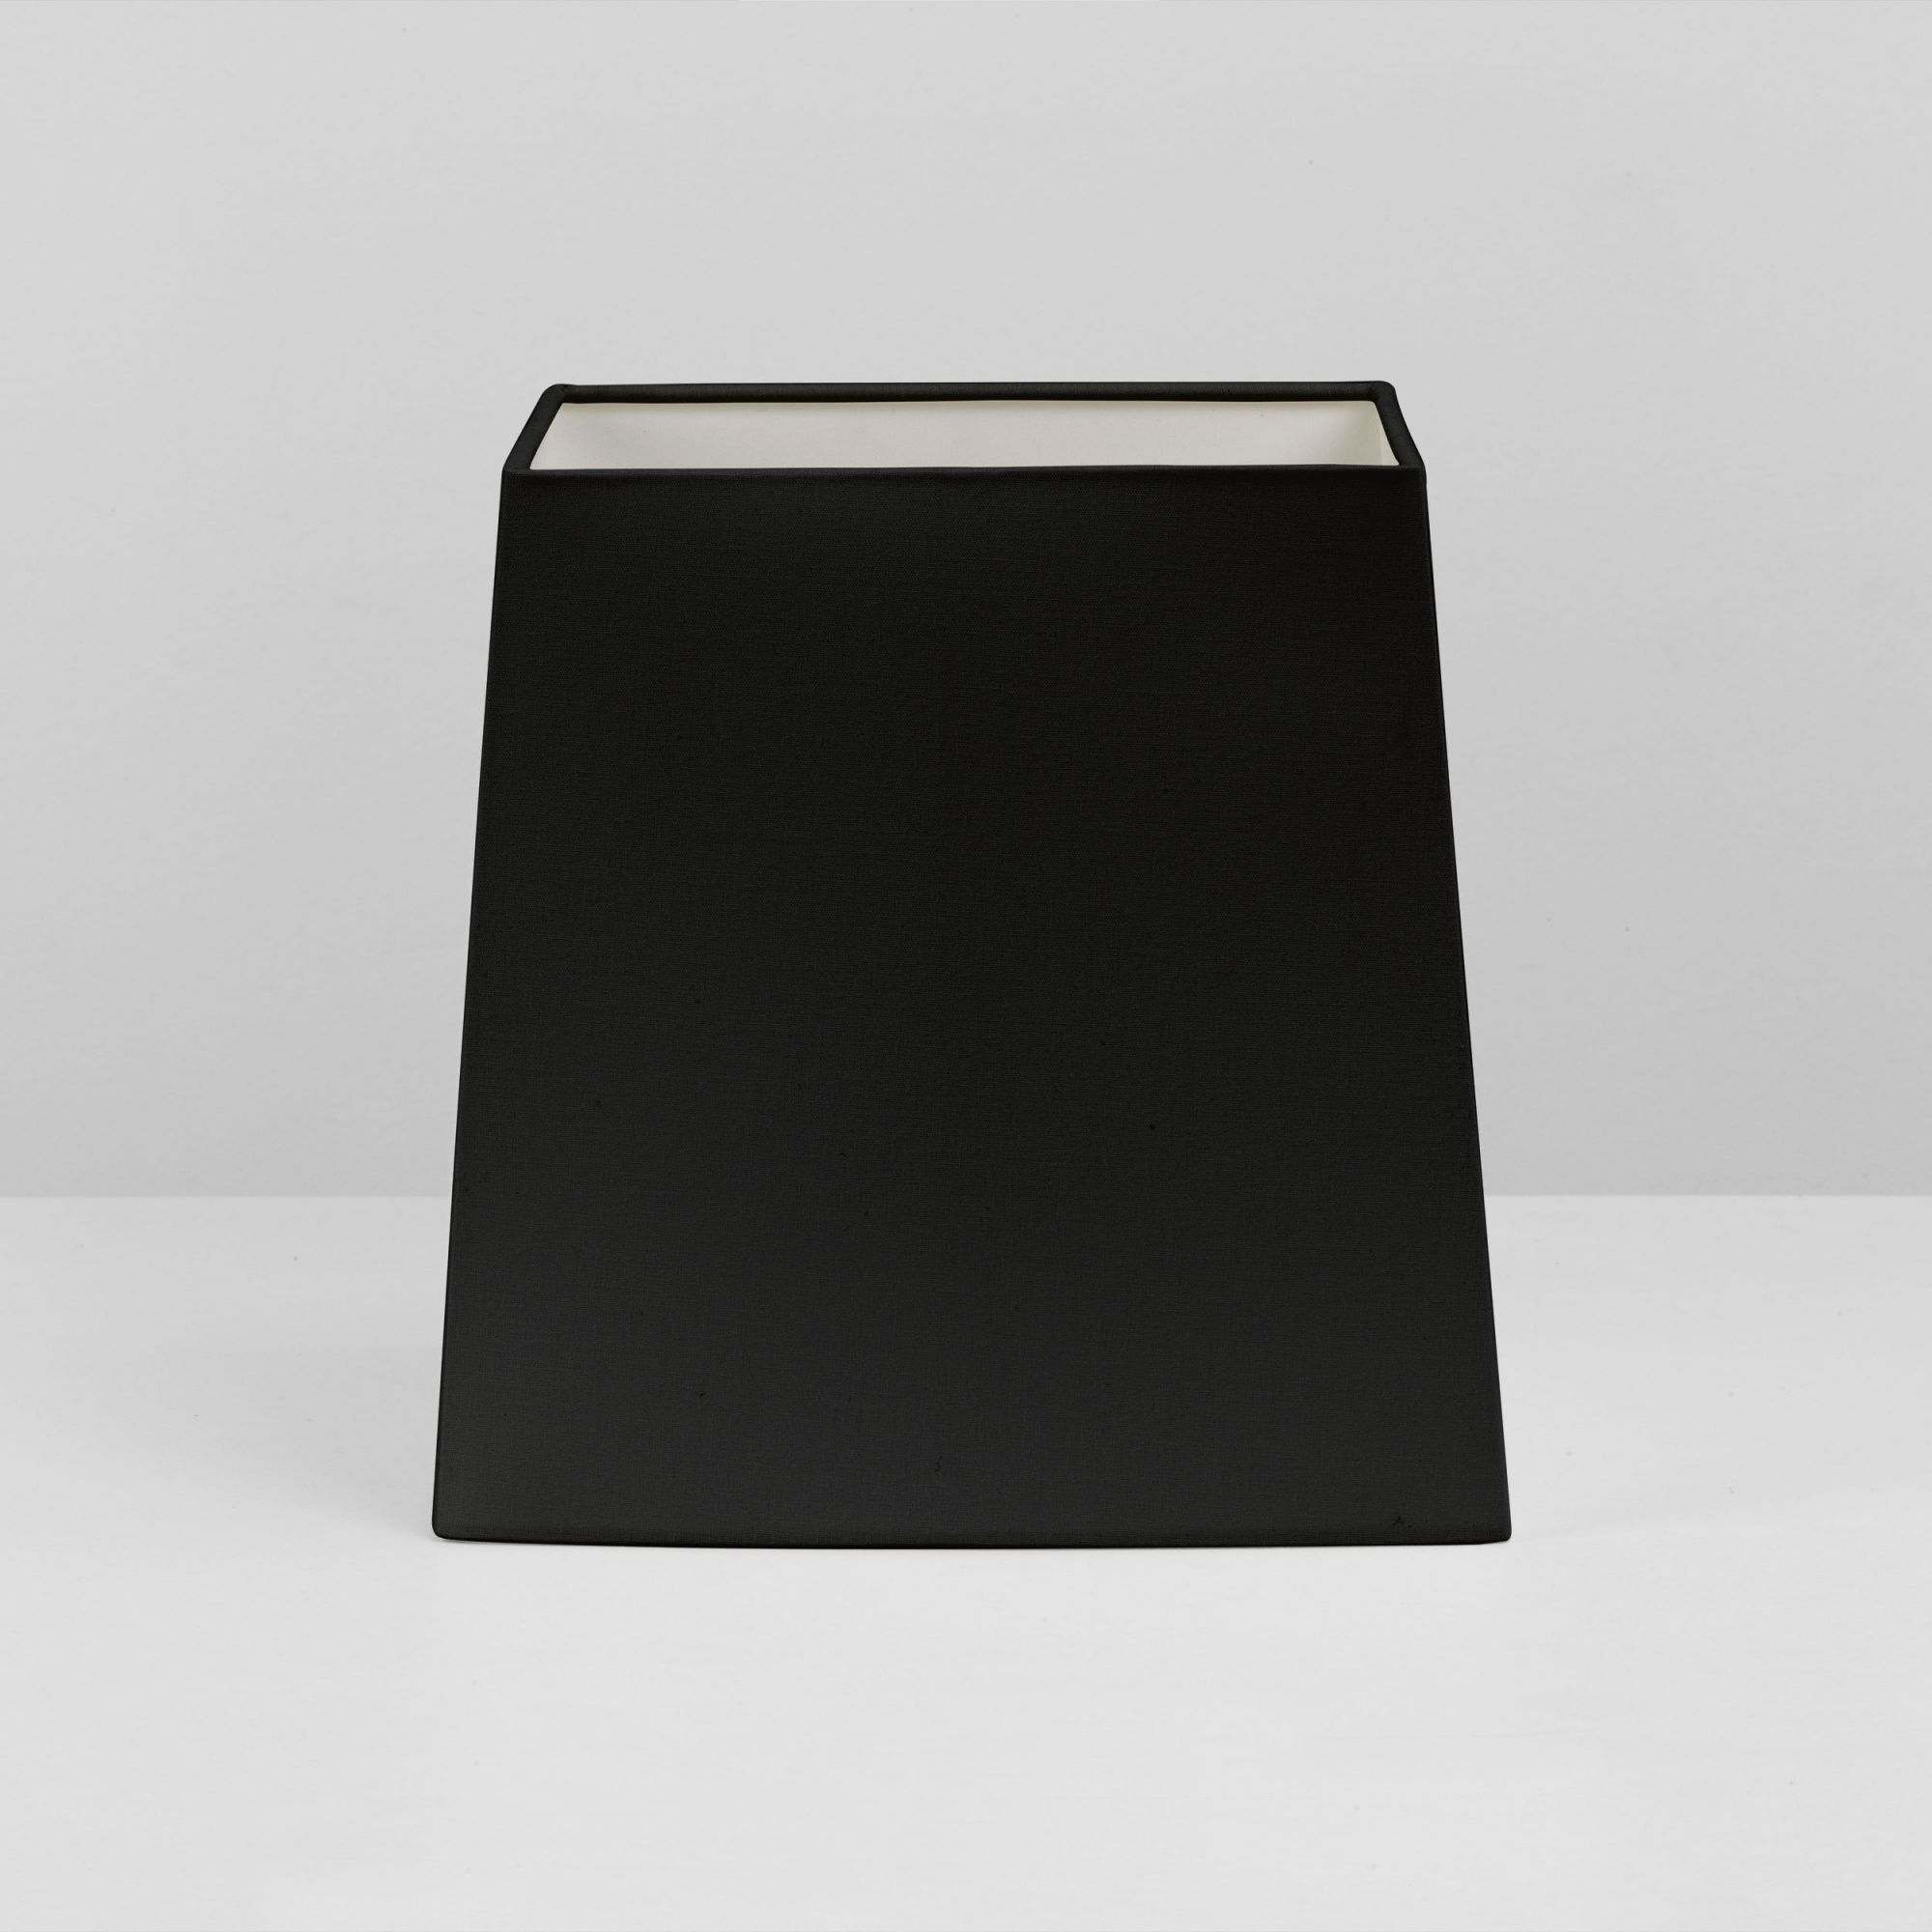 Abażur Azumi/Lambro 4019 Czarny Astro Lighting